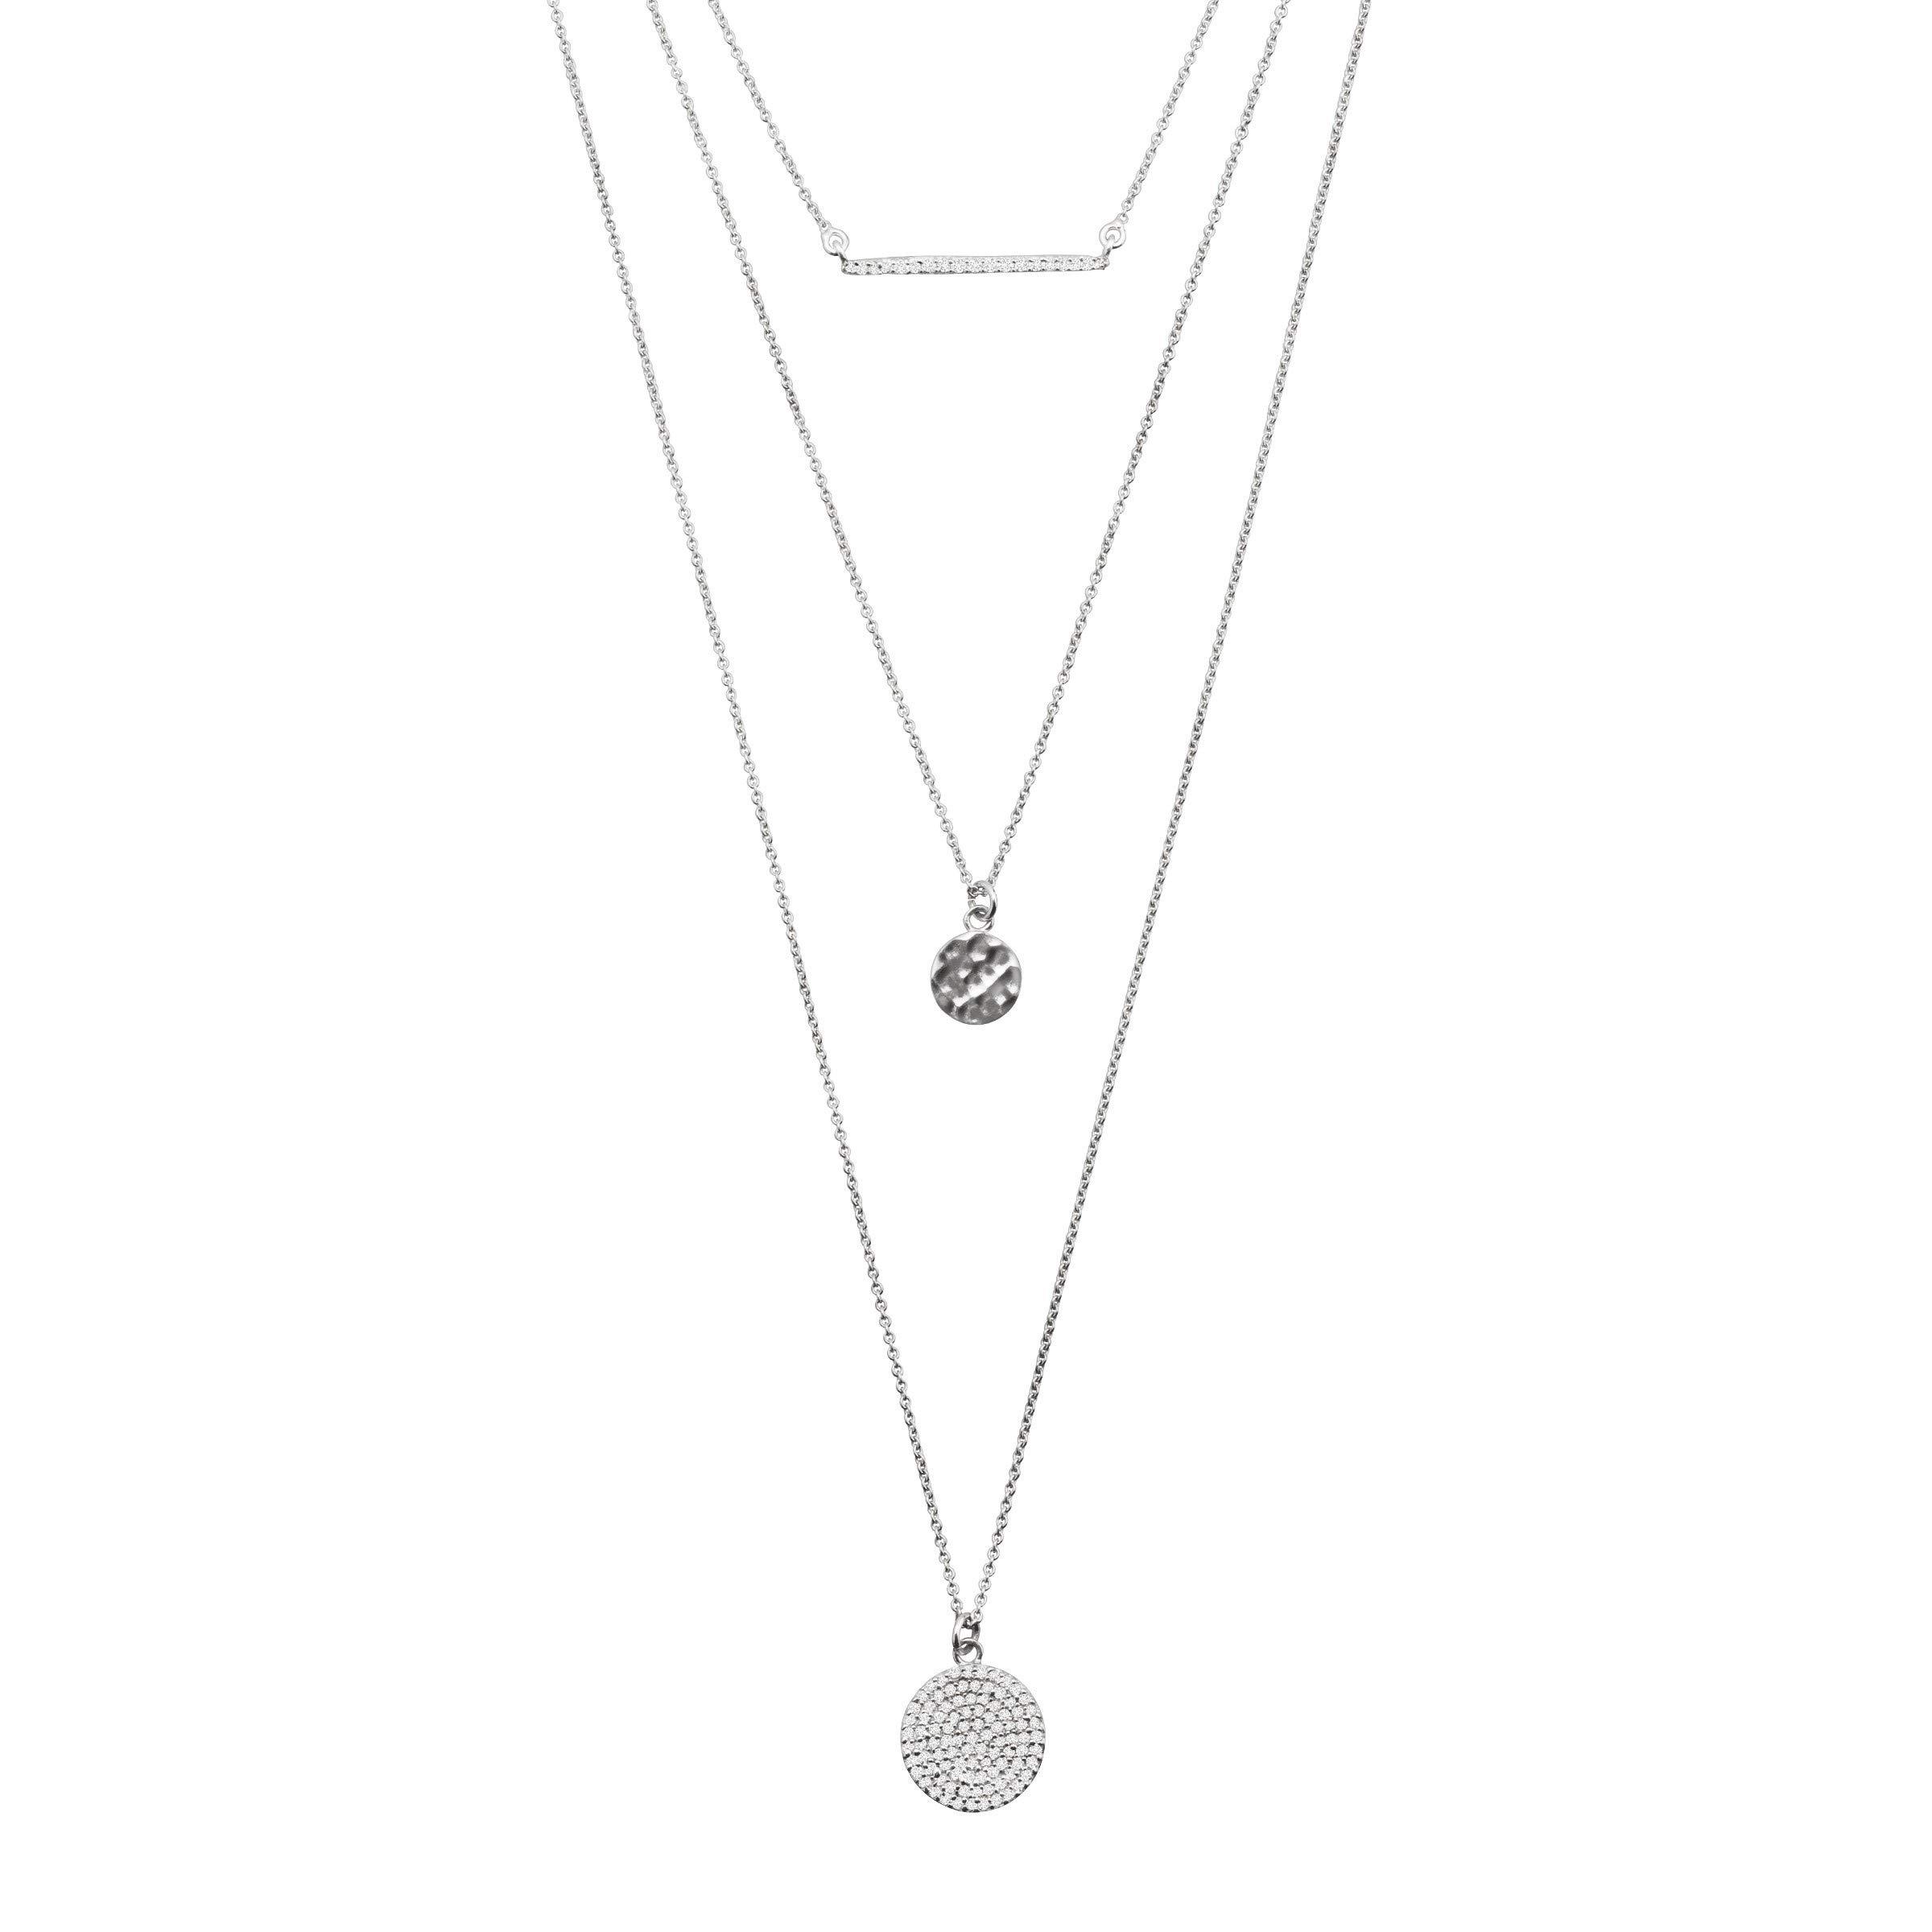 Silpada 'Triple Drop' 1/2 ct Cubic Zirconia Necklace in Sterling Silver by Silpada (Image #1)